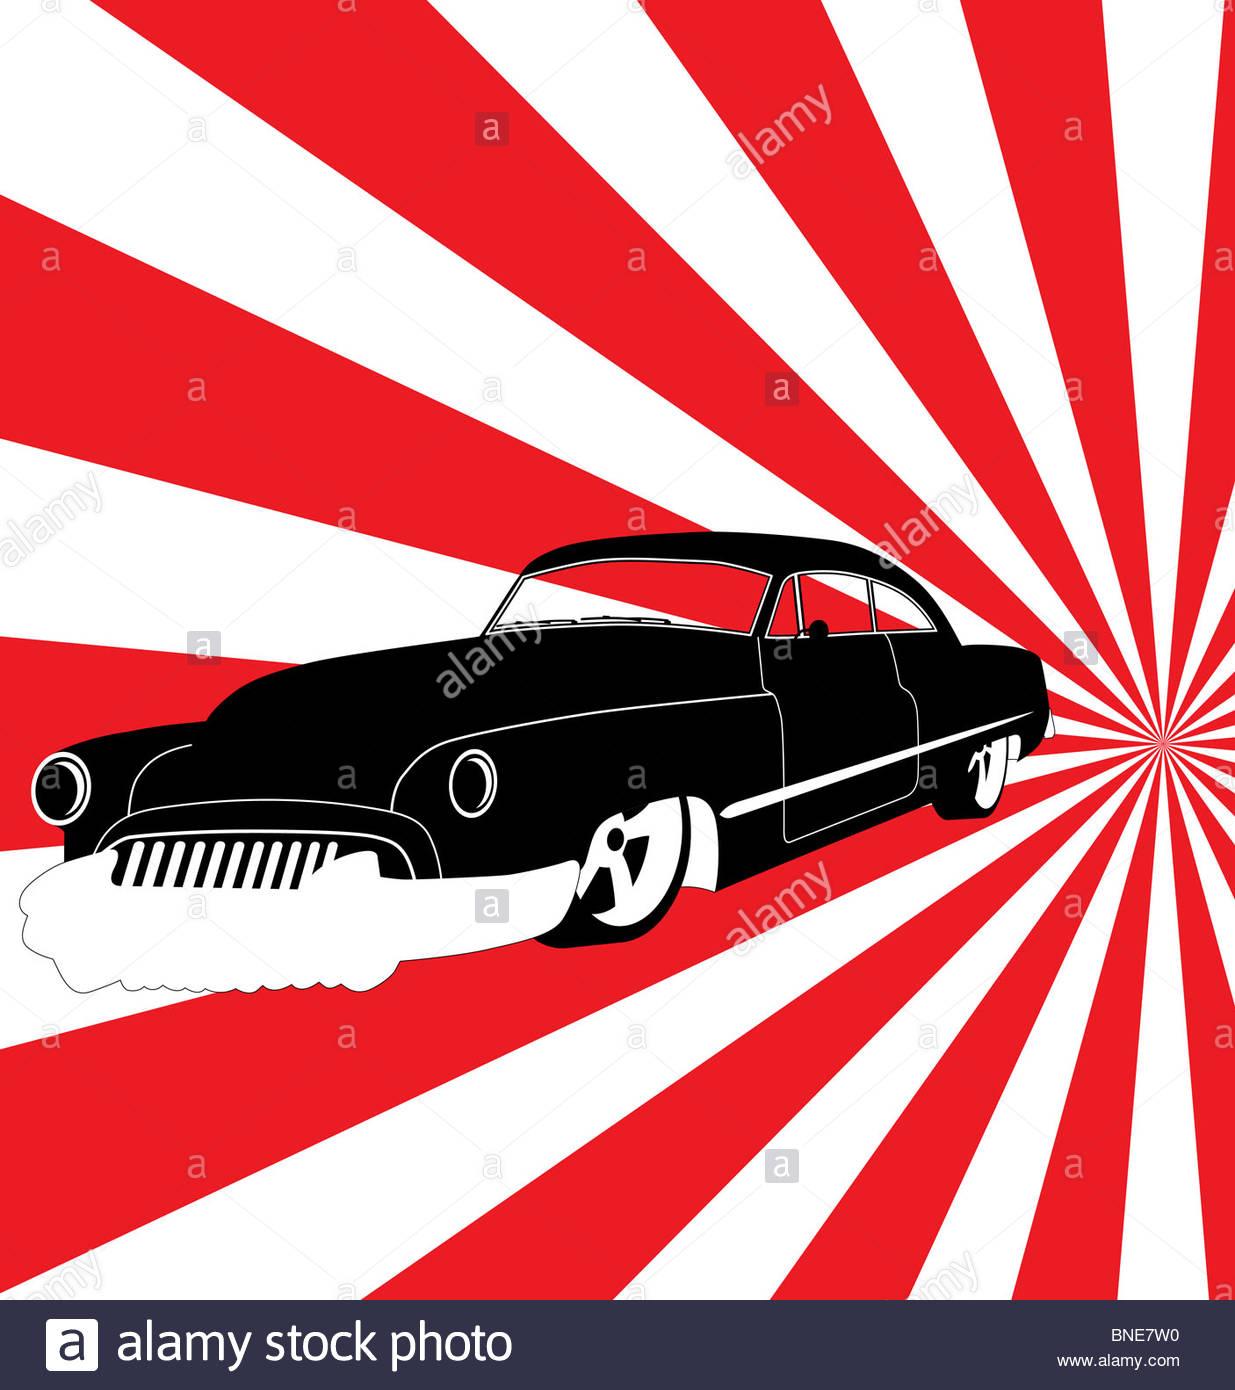 retro car illustration - Stock Image